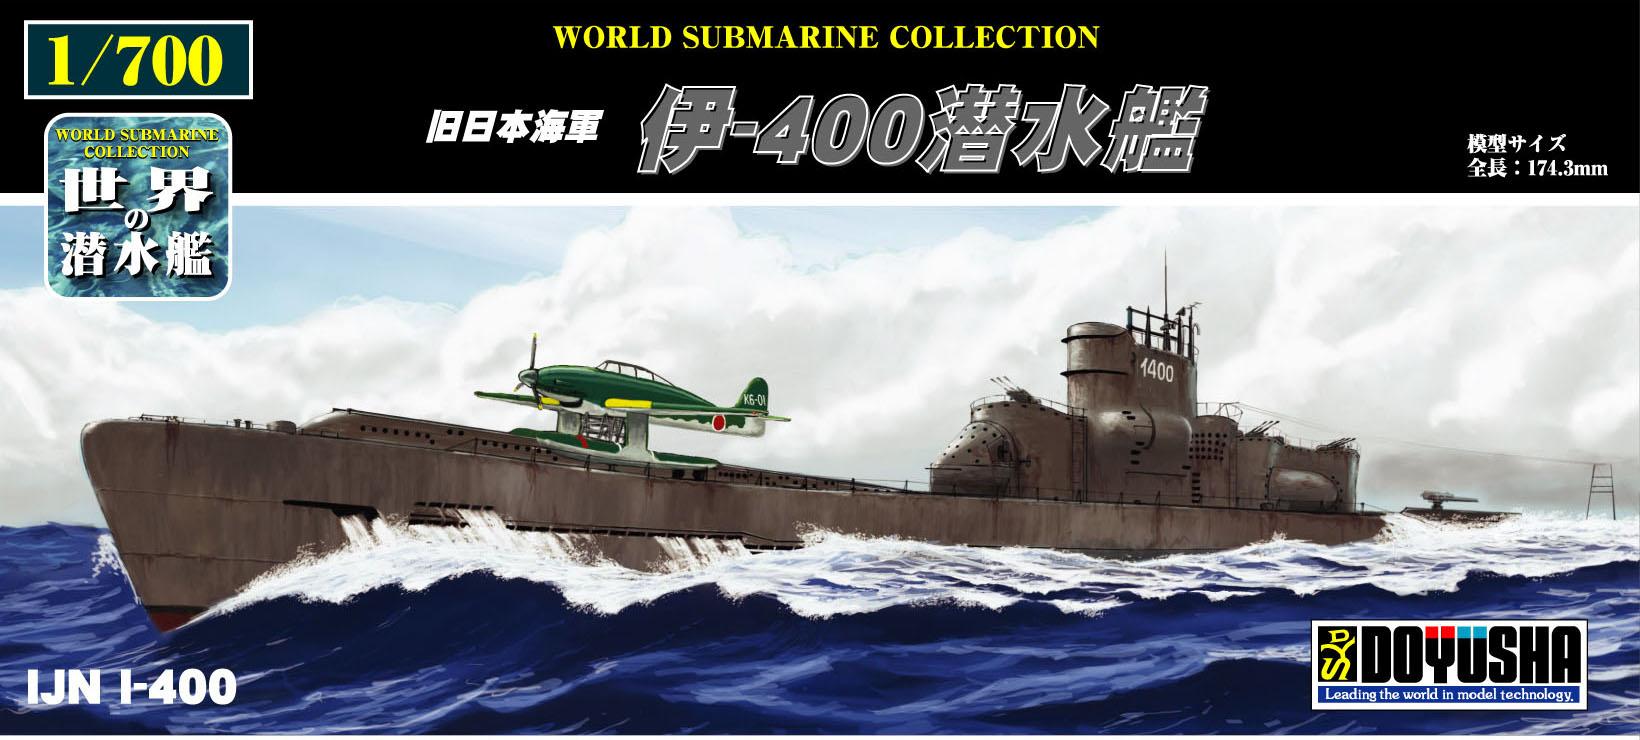 Doyusha 1/700 Japanese I-400 Class Submarine